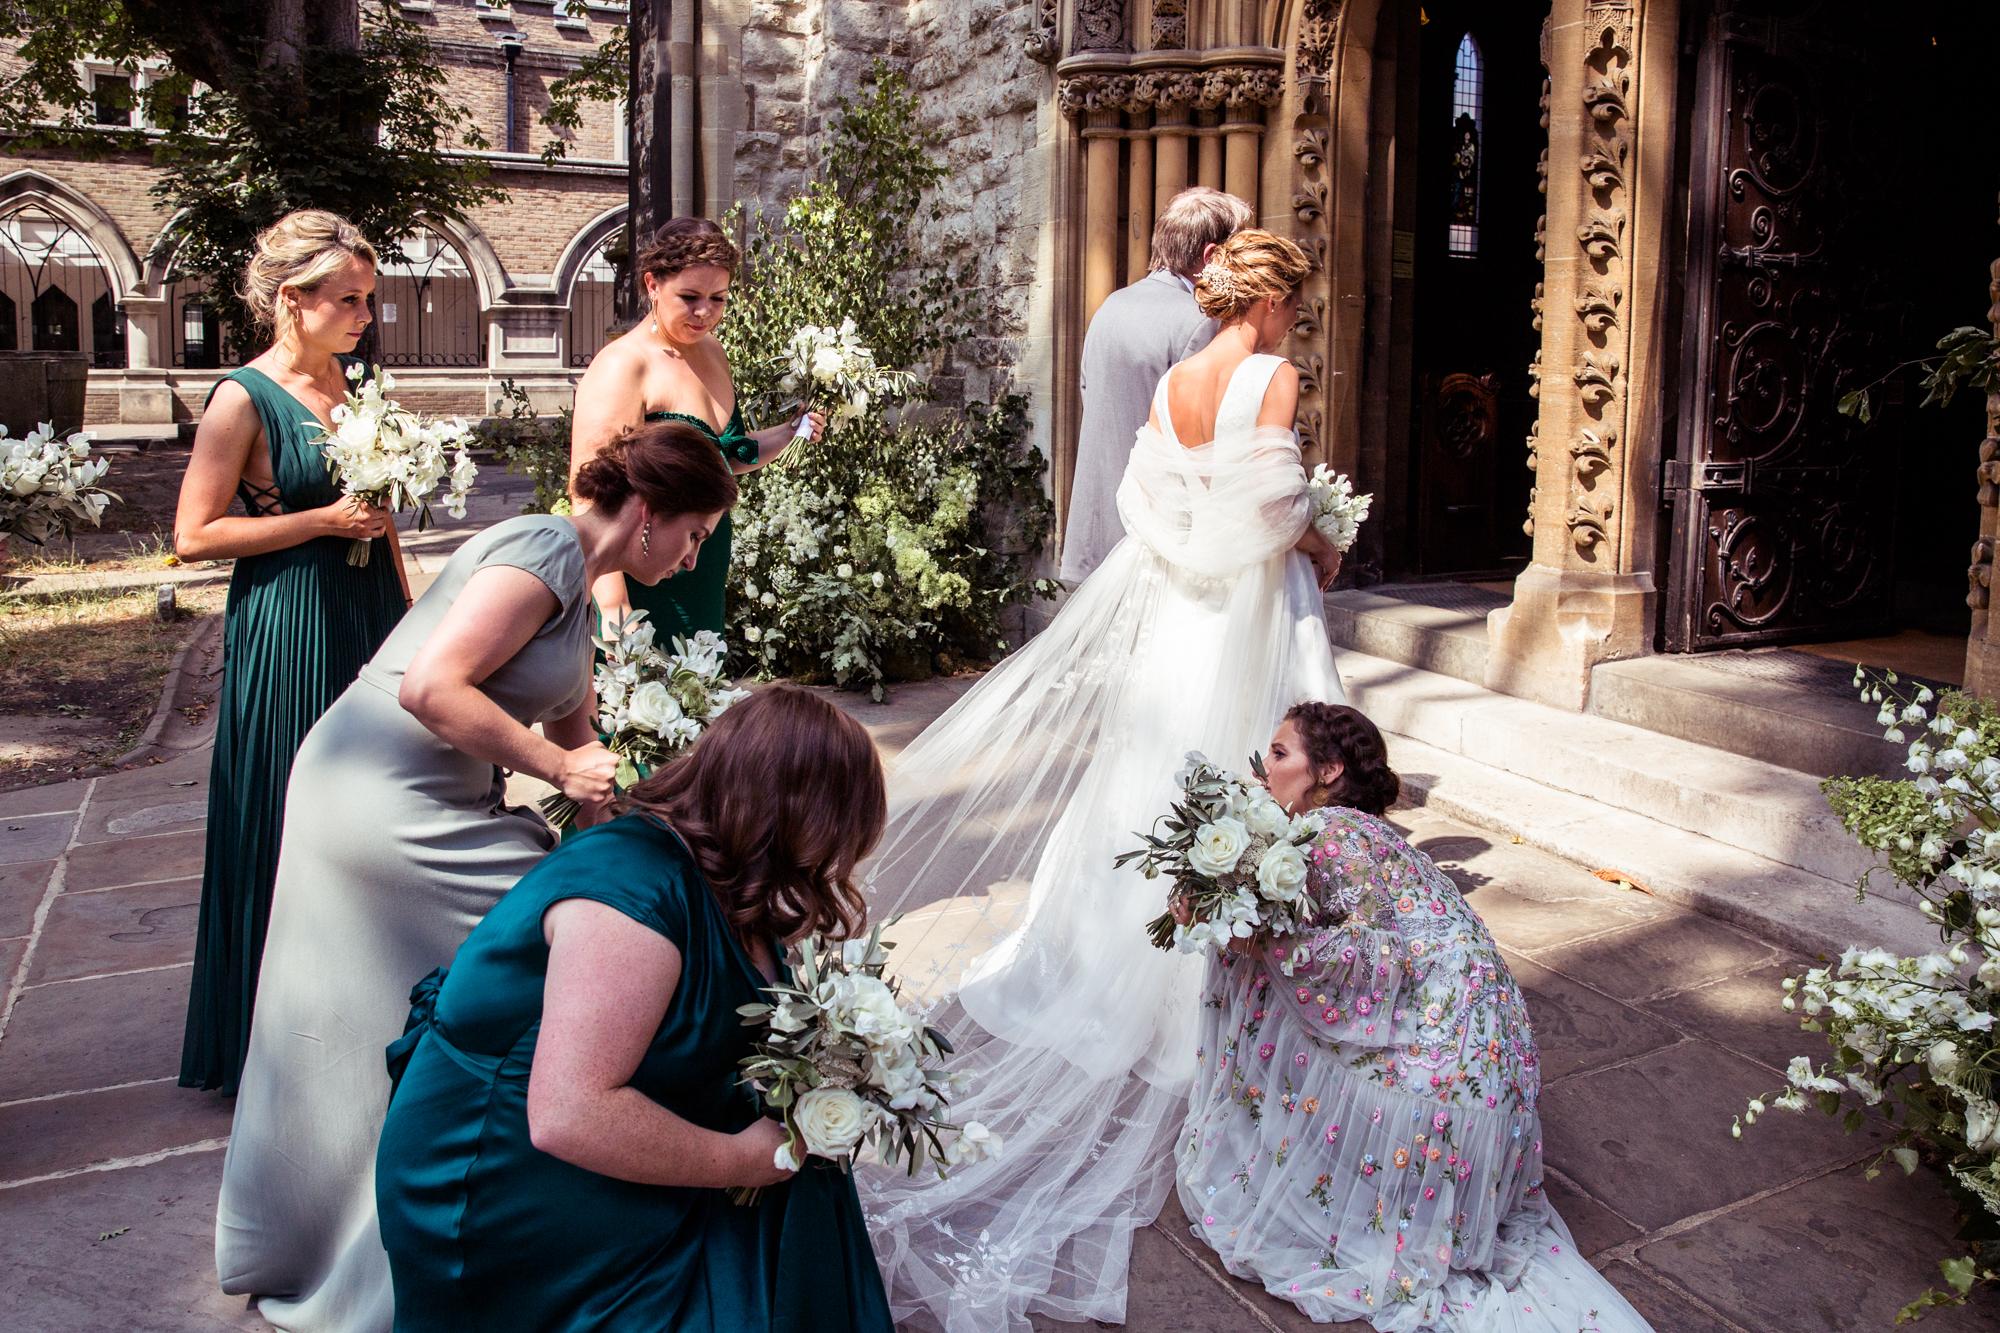 46c422d63 A Chic Phillipa Lepley Dress for a Classic + Elegant Kew Gardens Wedding |  Love My Dress® UK Wedding Blog + Wedding Directory